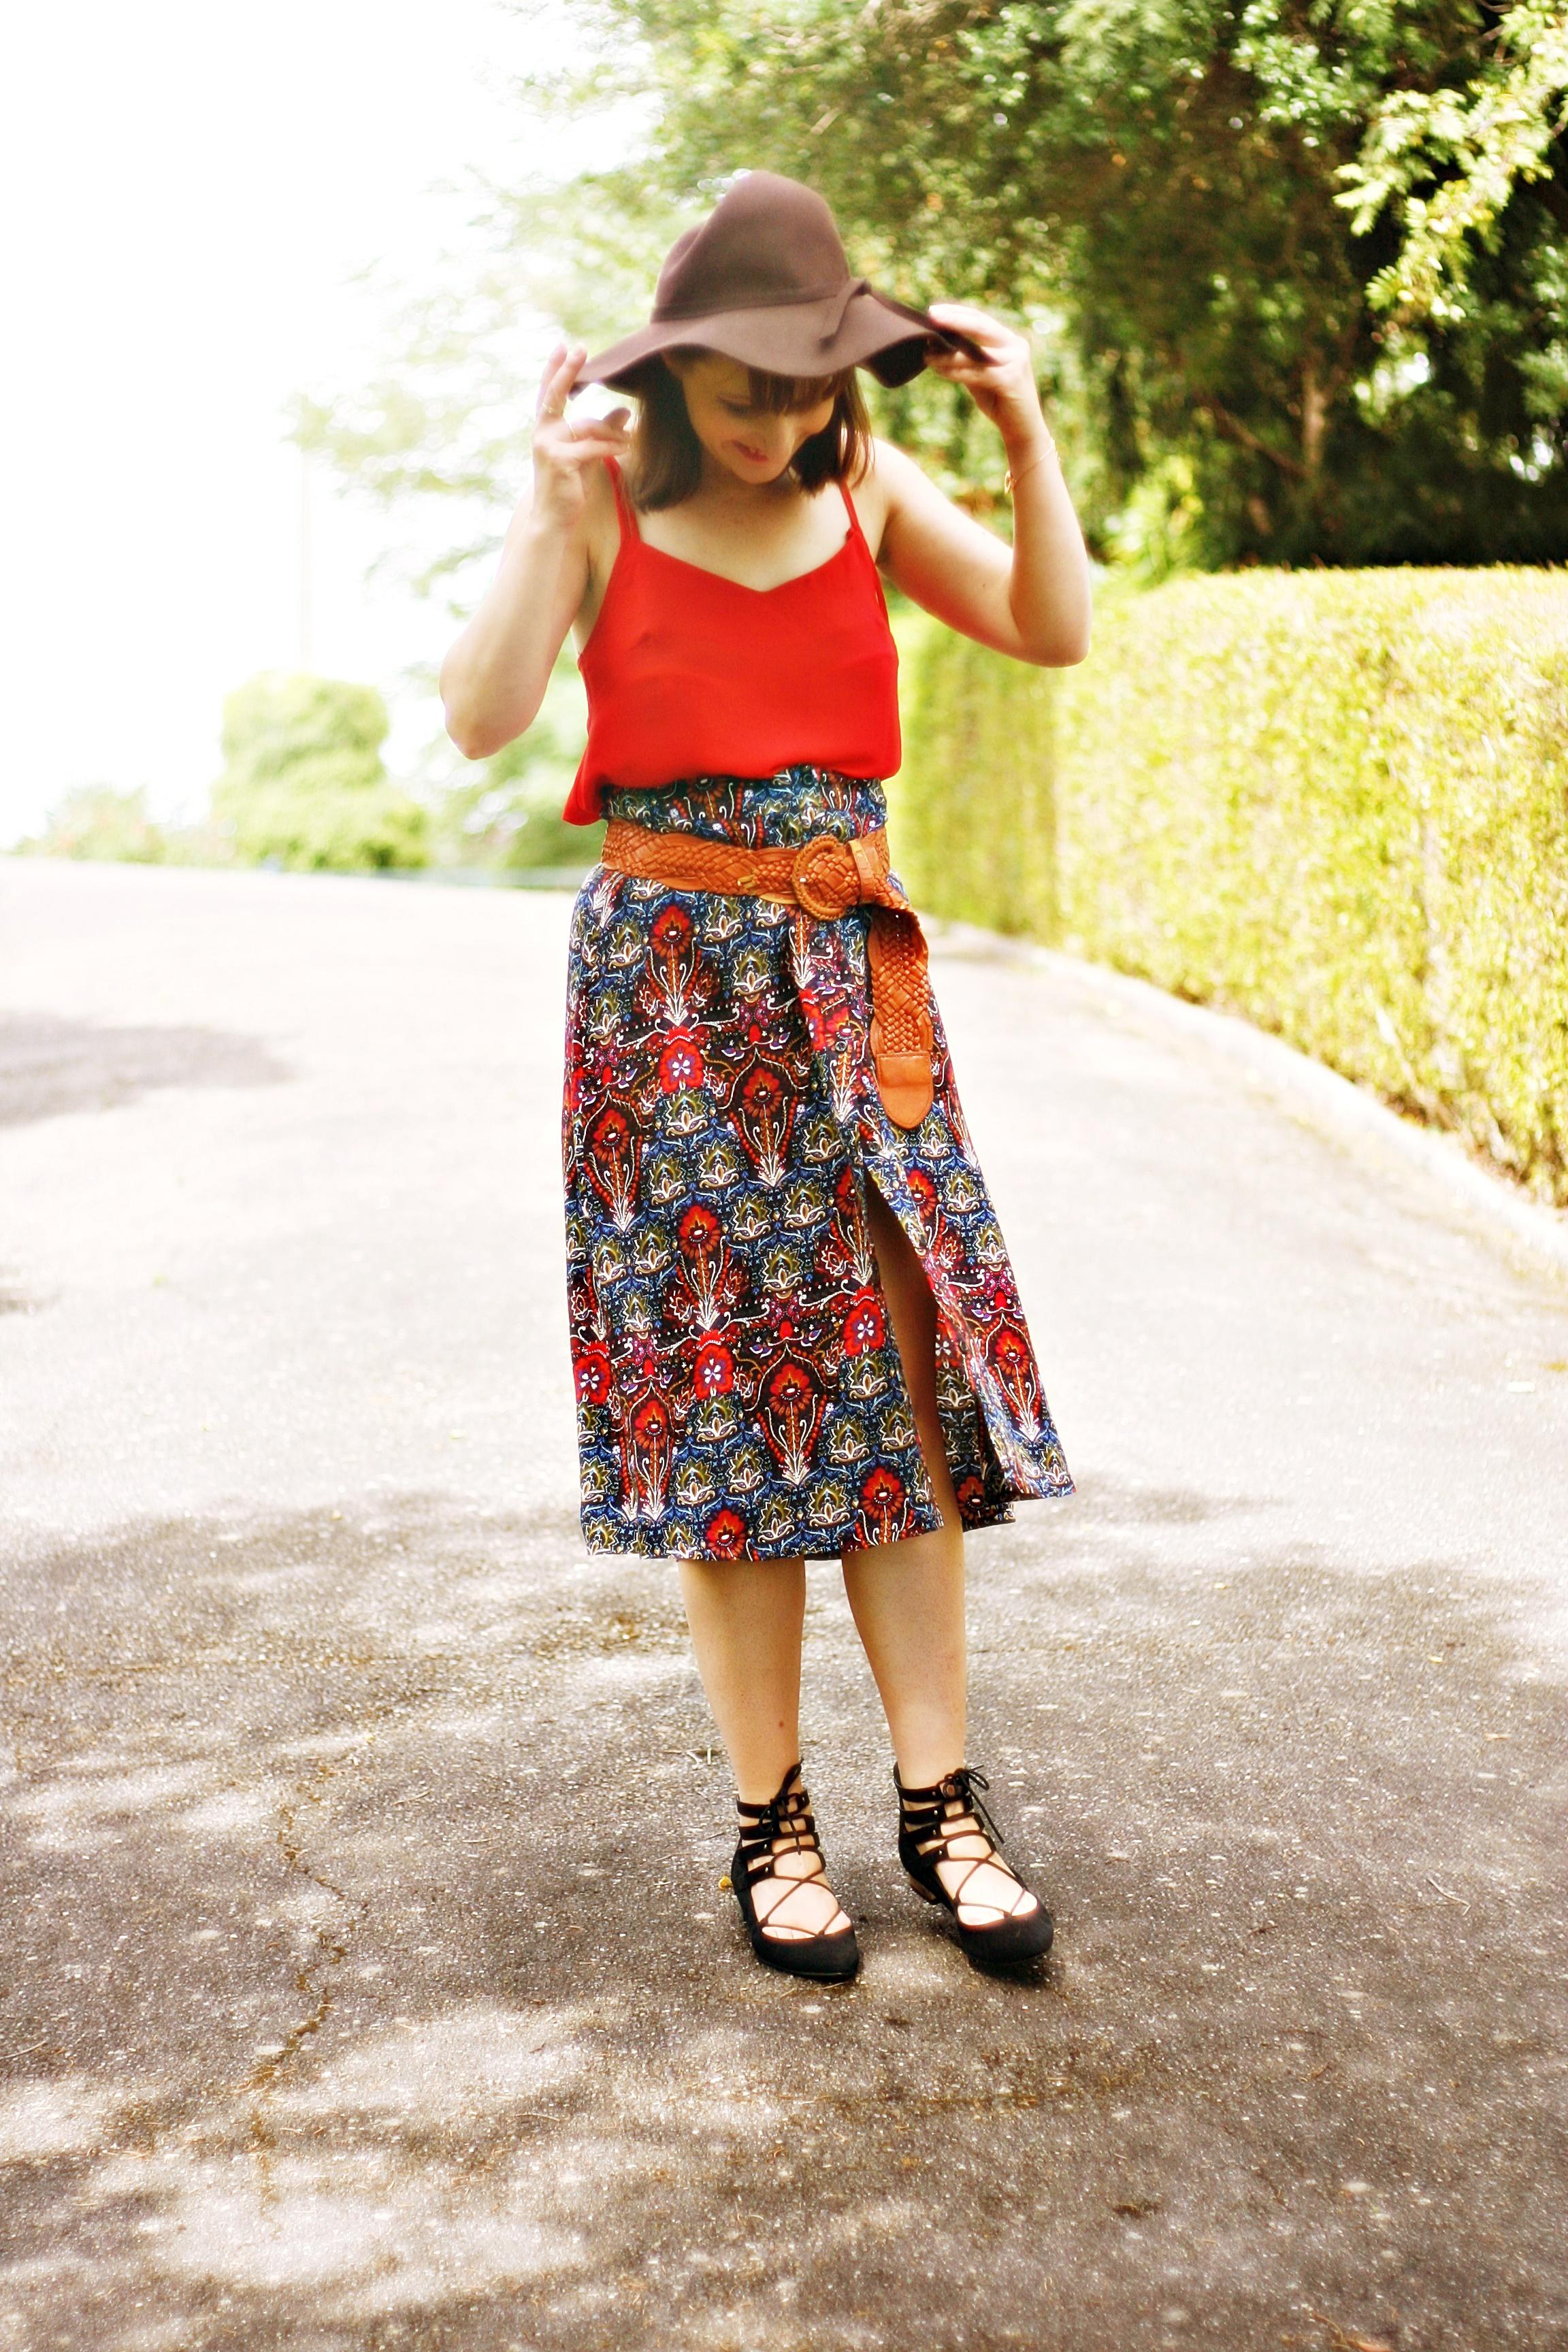 look-jupe-imprimée-blog-mode-femme-toulouse-capeline-chaussuresàlacets-streetstyle-ballerineslacets